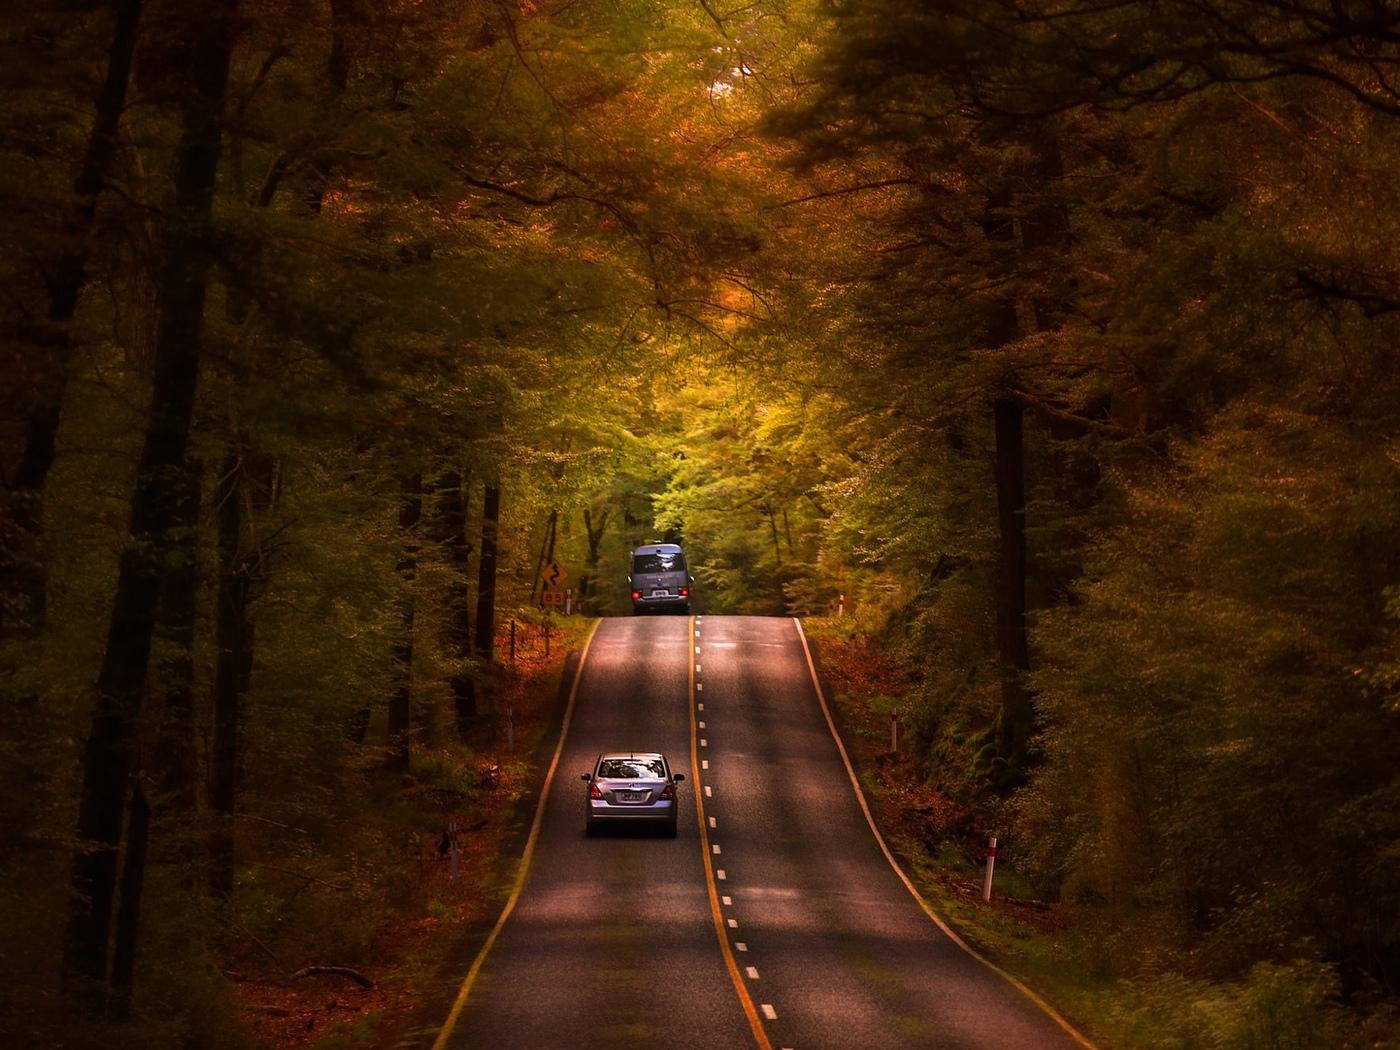 природа, лес, осень, дорога, авто